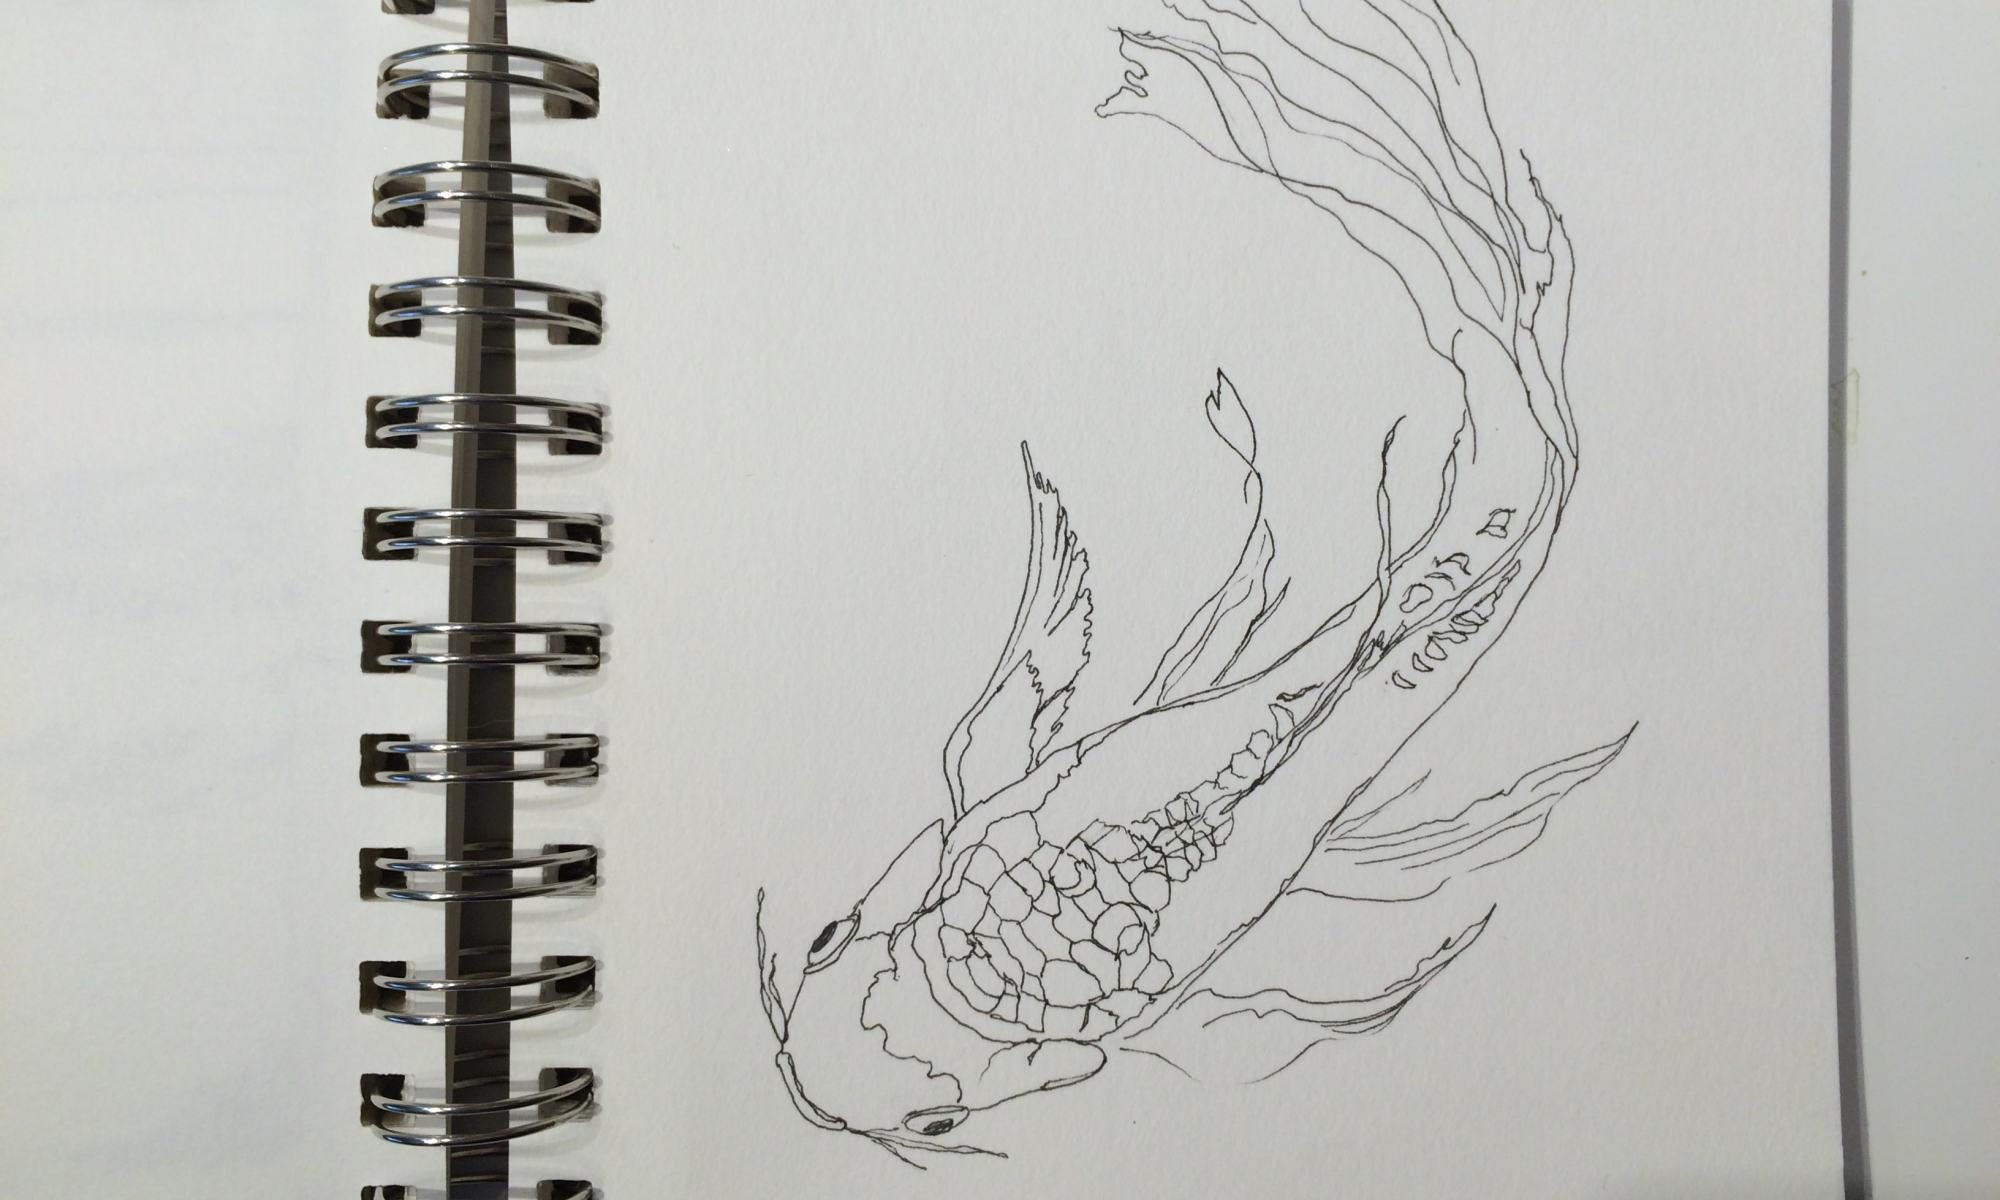 Butterfly koi sketch.